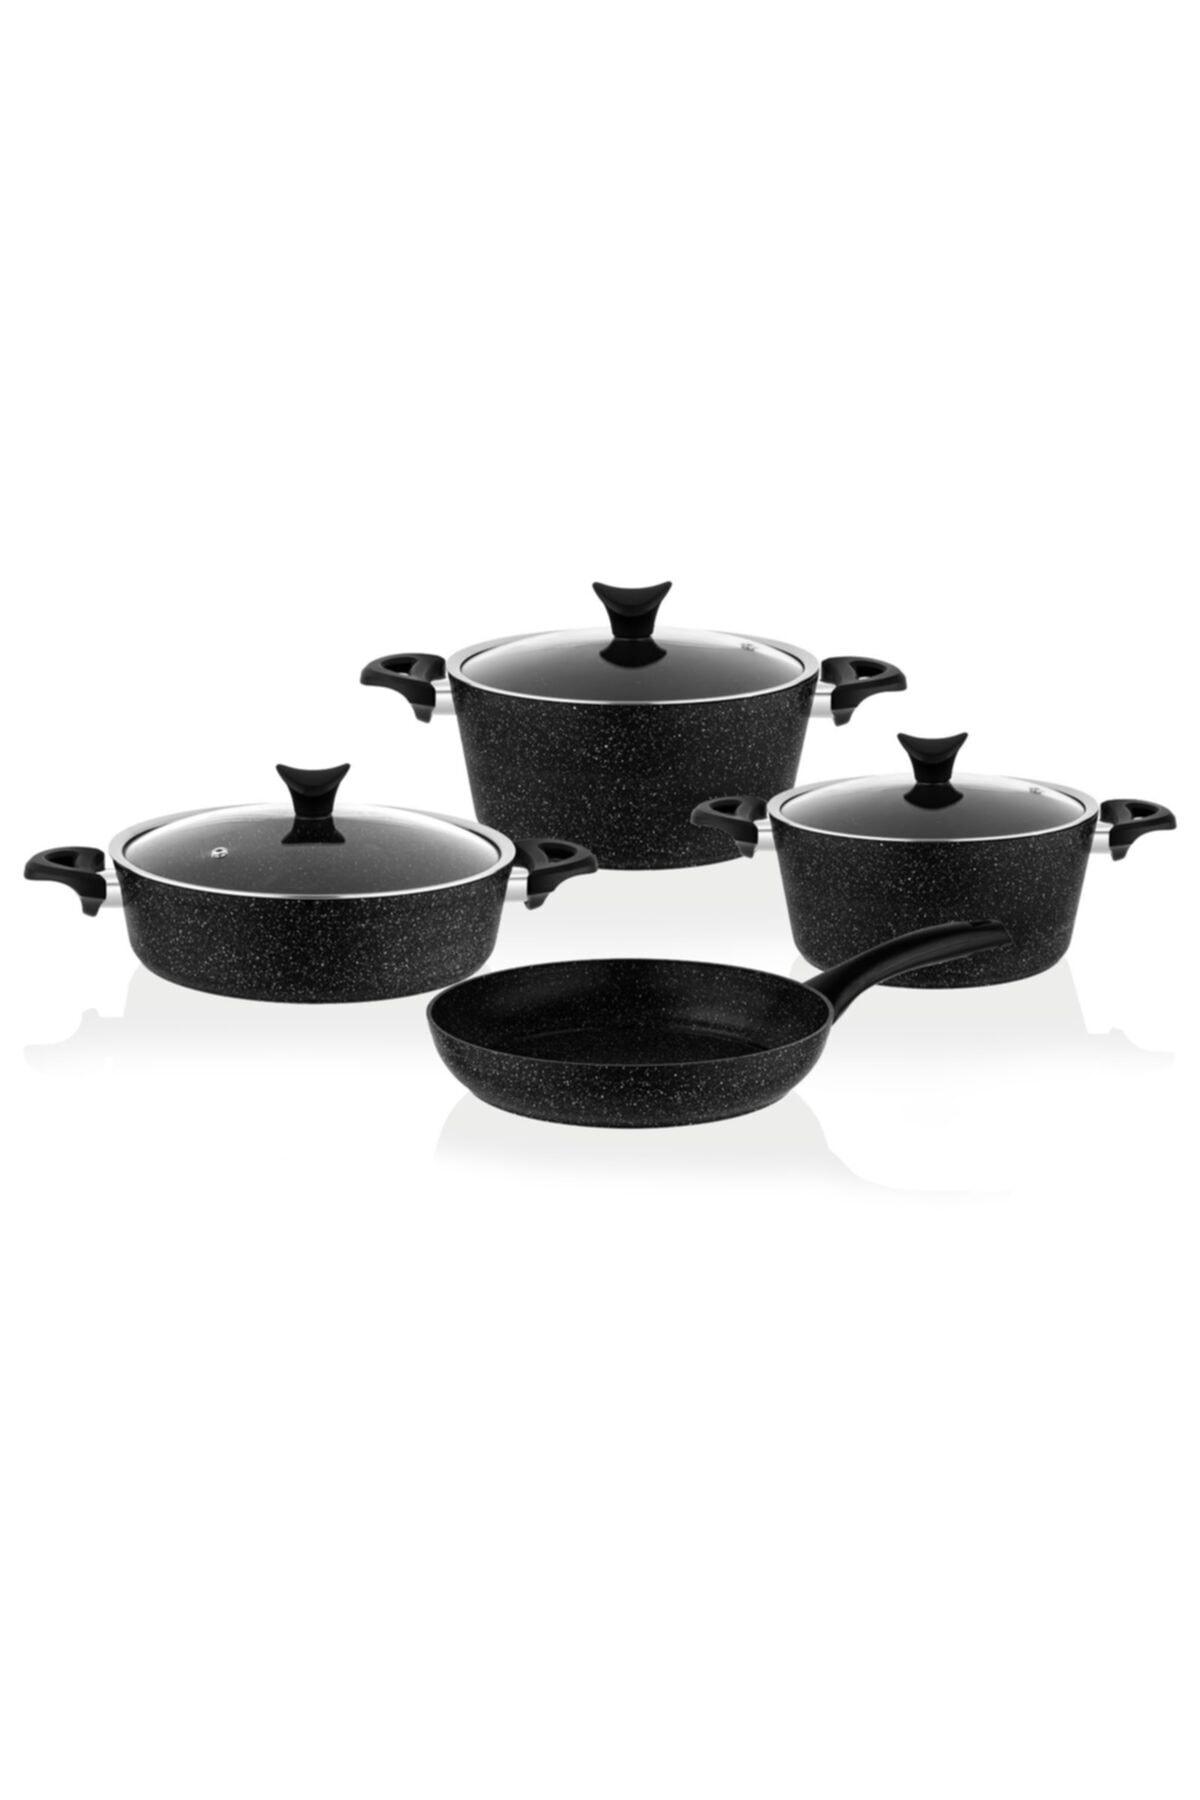 Taç 3455 Master Cook 7 Parça Granit Tencere Seti Siyah 1